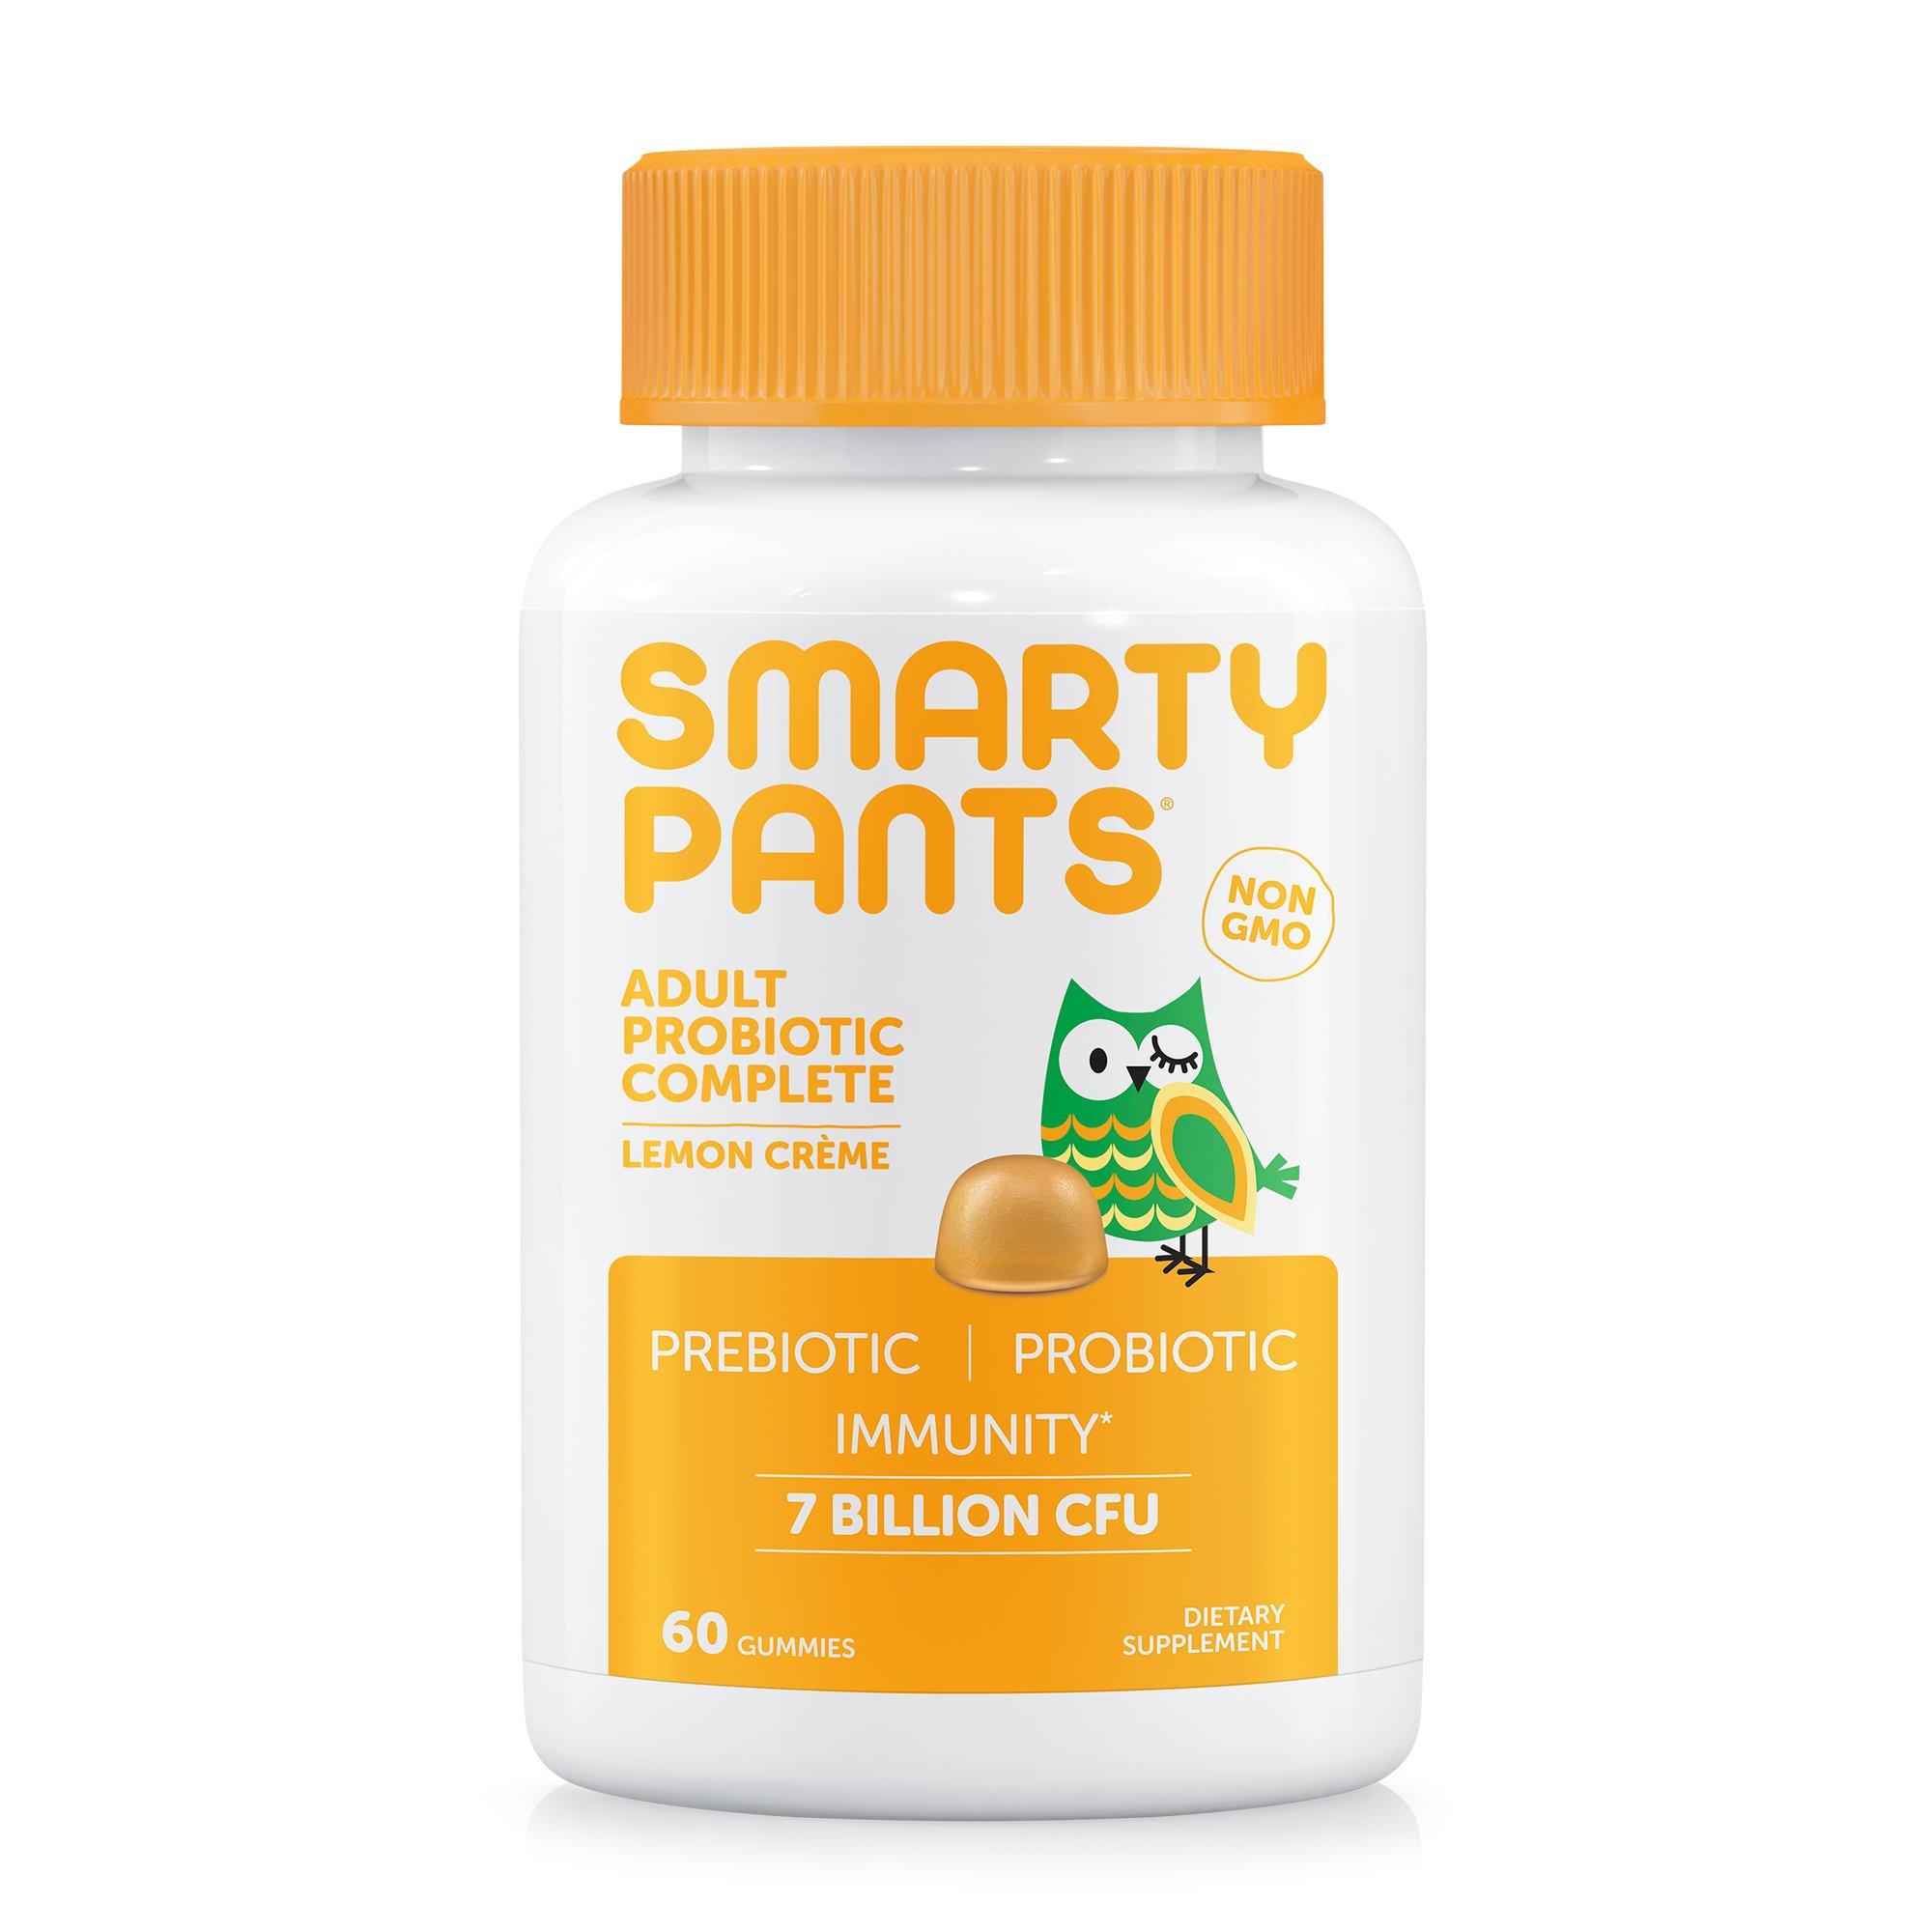 SmartyPants Adult Probiotic Complete; Probiotics & Prebiotics; Digestive & Immune Support* Gummies; 7 billion CFU, VEGAN, NON-GMO, NO REFRIGERATION REQUIRED, Lemon Creme; 60 COUNT, 30 DAY SUPPLY